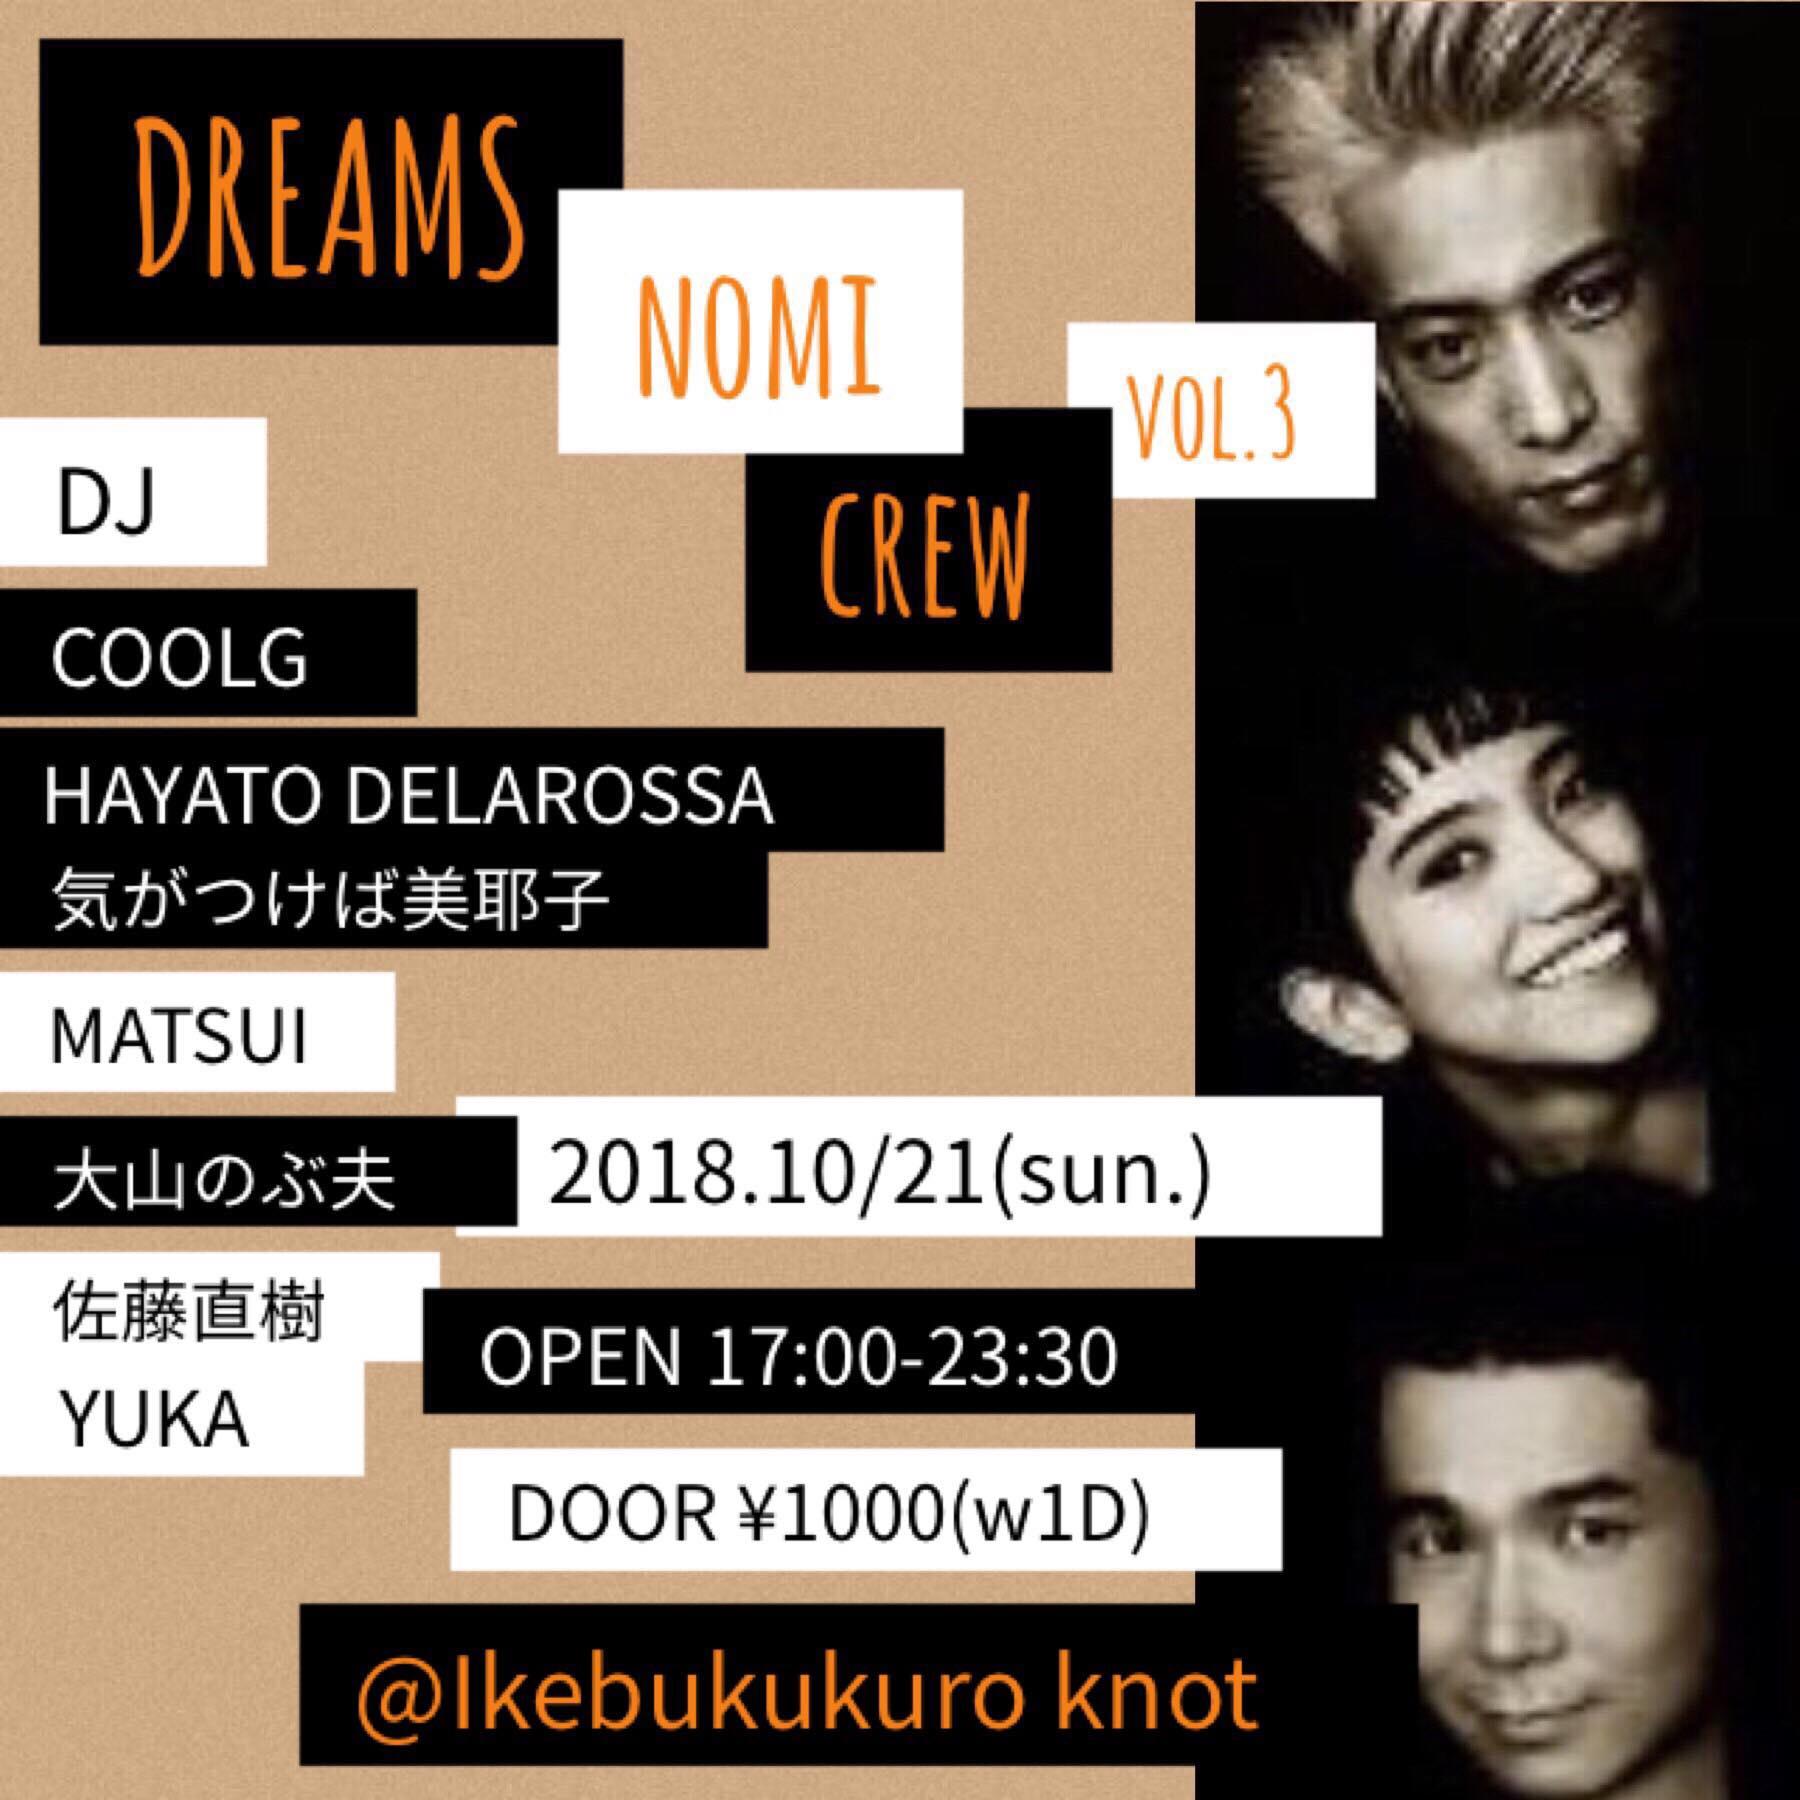 【DREAMS NOMI CREW vol.3】 2018.10/21(sun.) 池袋knot